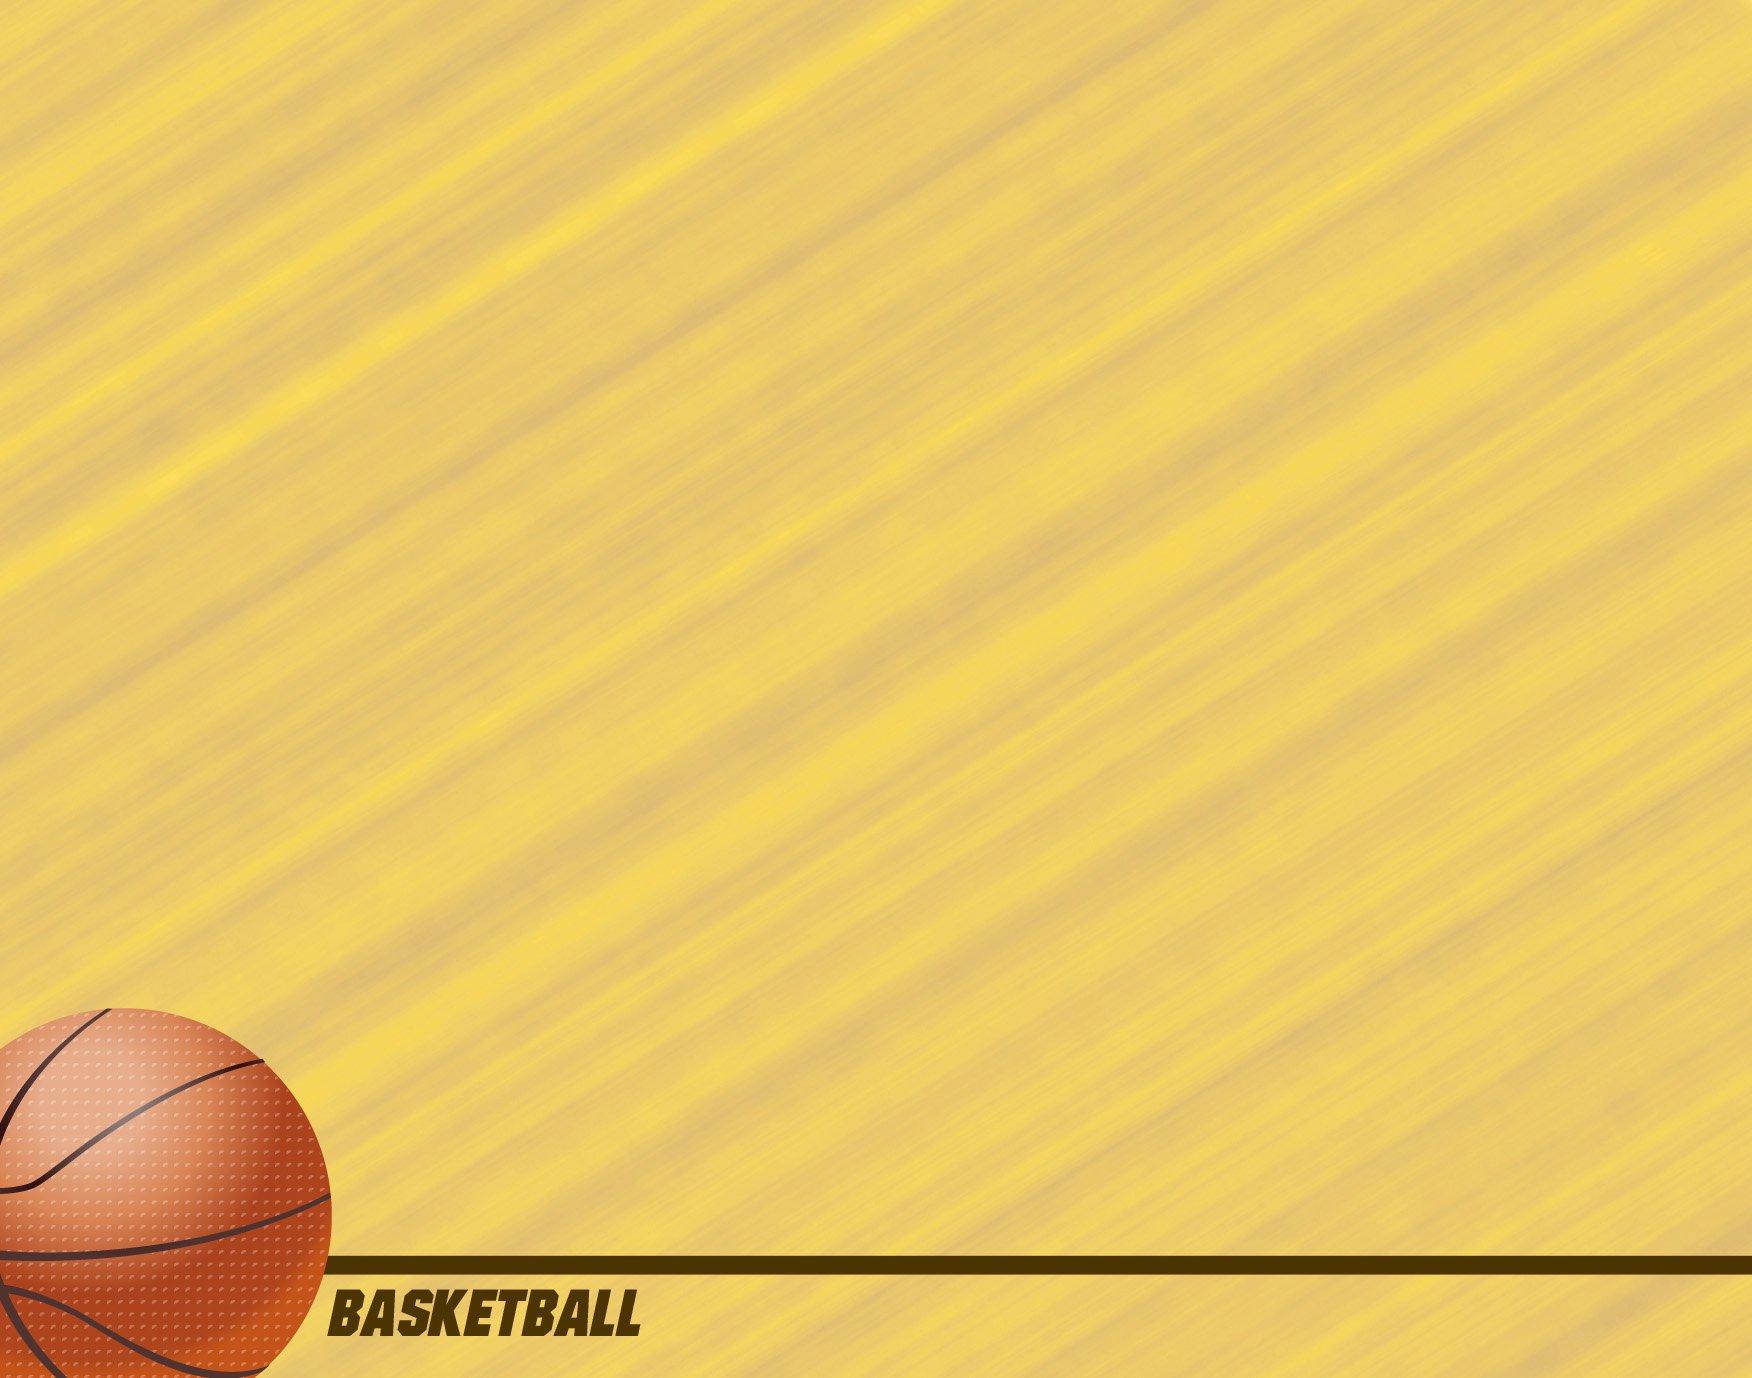 Basketball Powerpoint Template Fresh Free Basketball Backgrounds Wallpapersafari